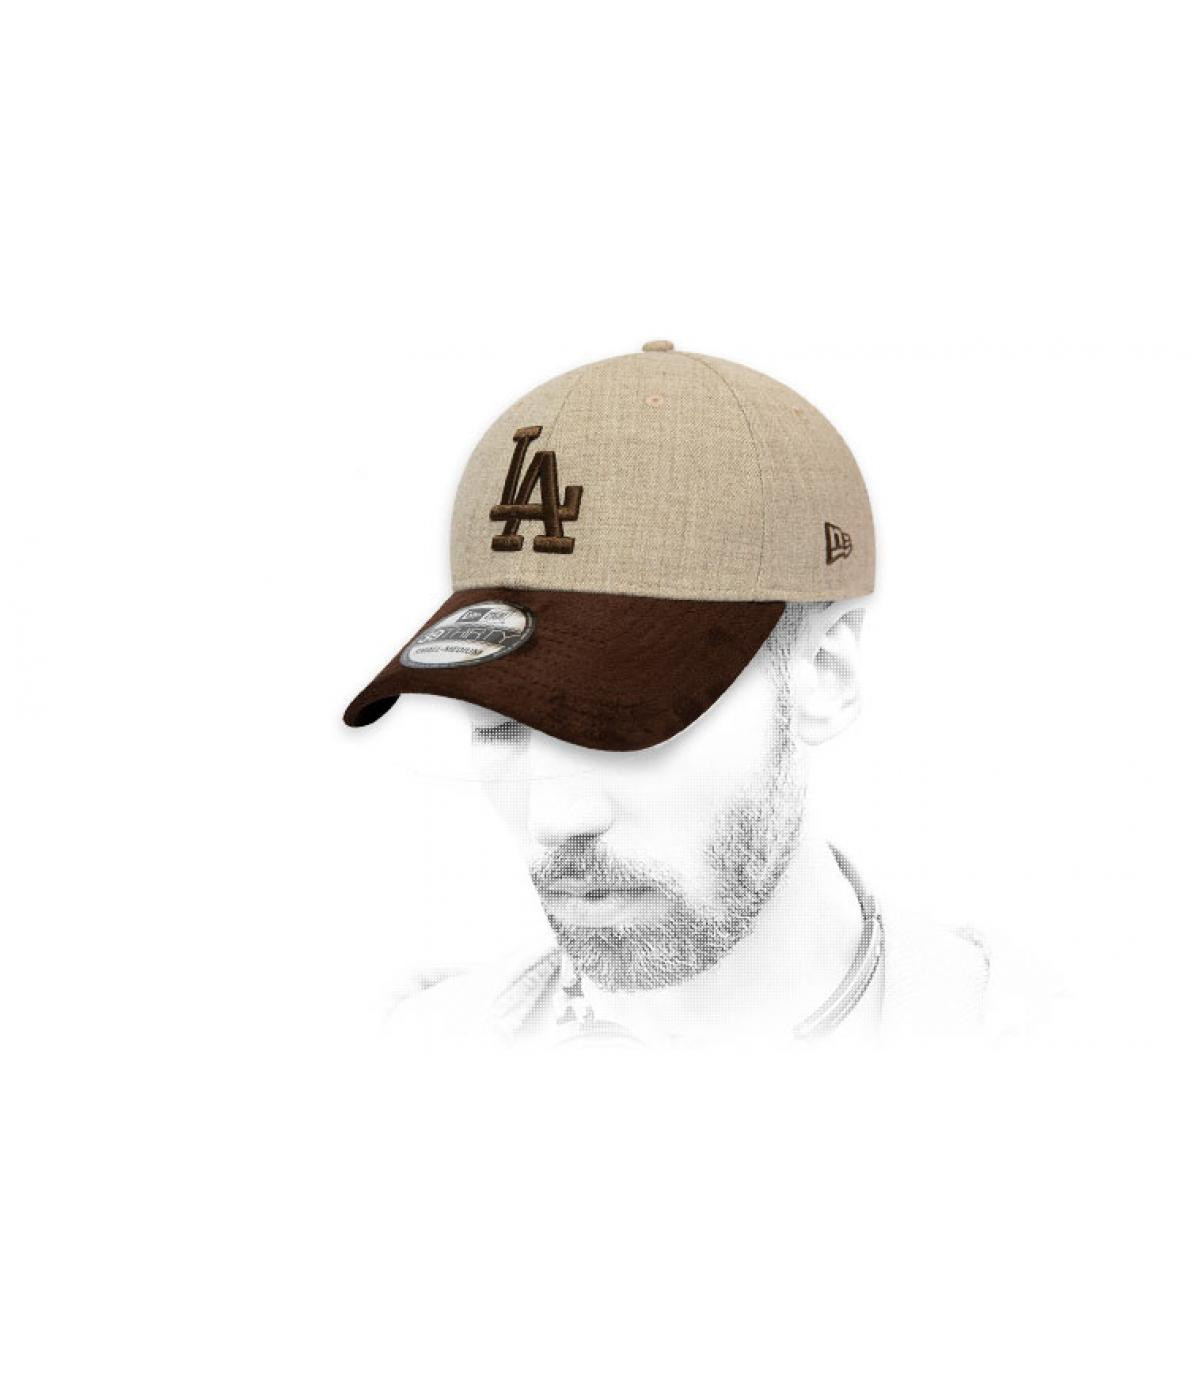 beige brown LA cap suede